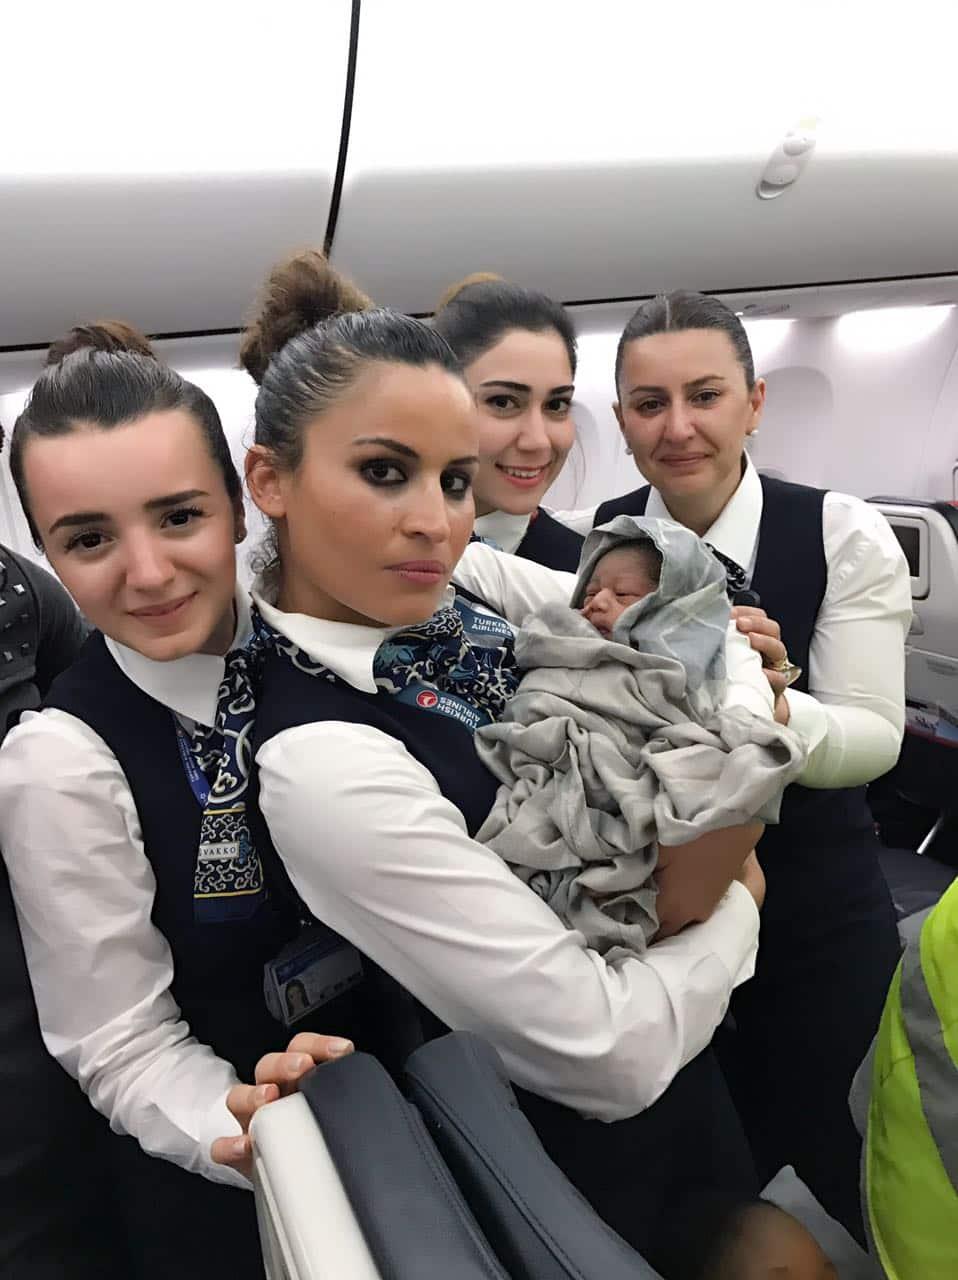 Turkish airlines, baby born turkish airlines, baby born mid flight, baby born mid air, baby born turkish airline mid flight, in-flight child birth, viral news, turkey news, world news, latest news, indian express